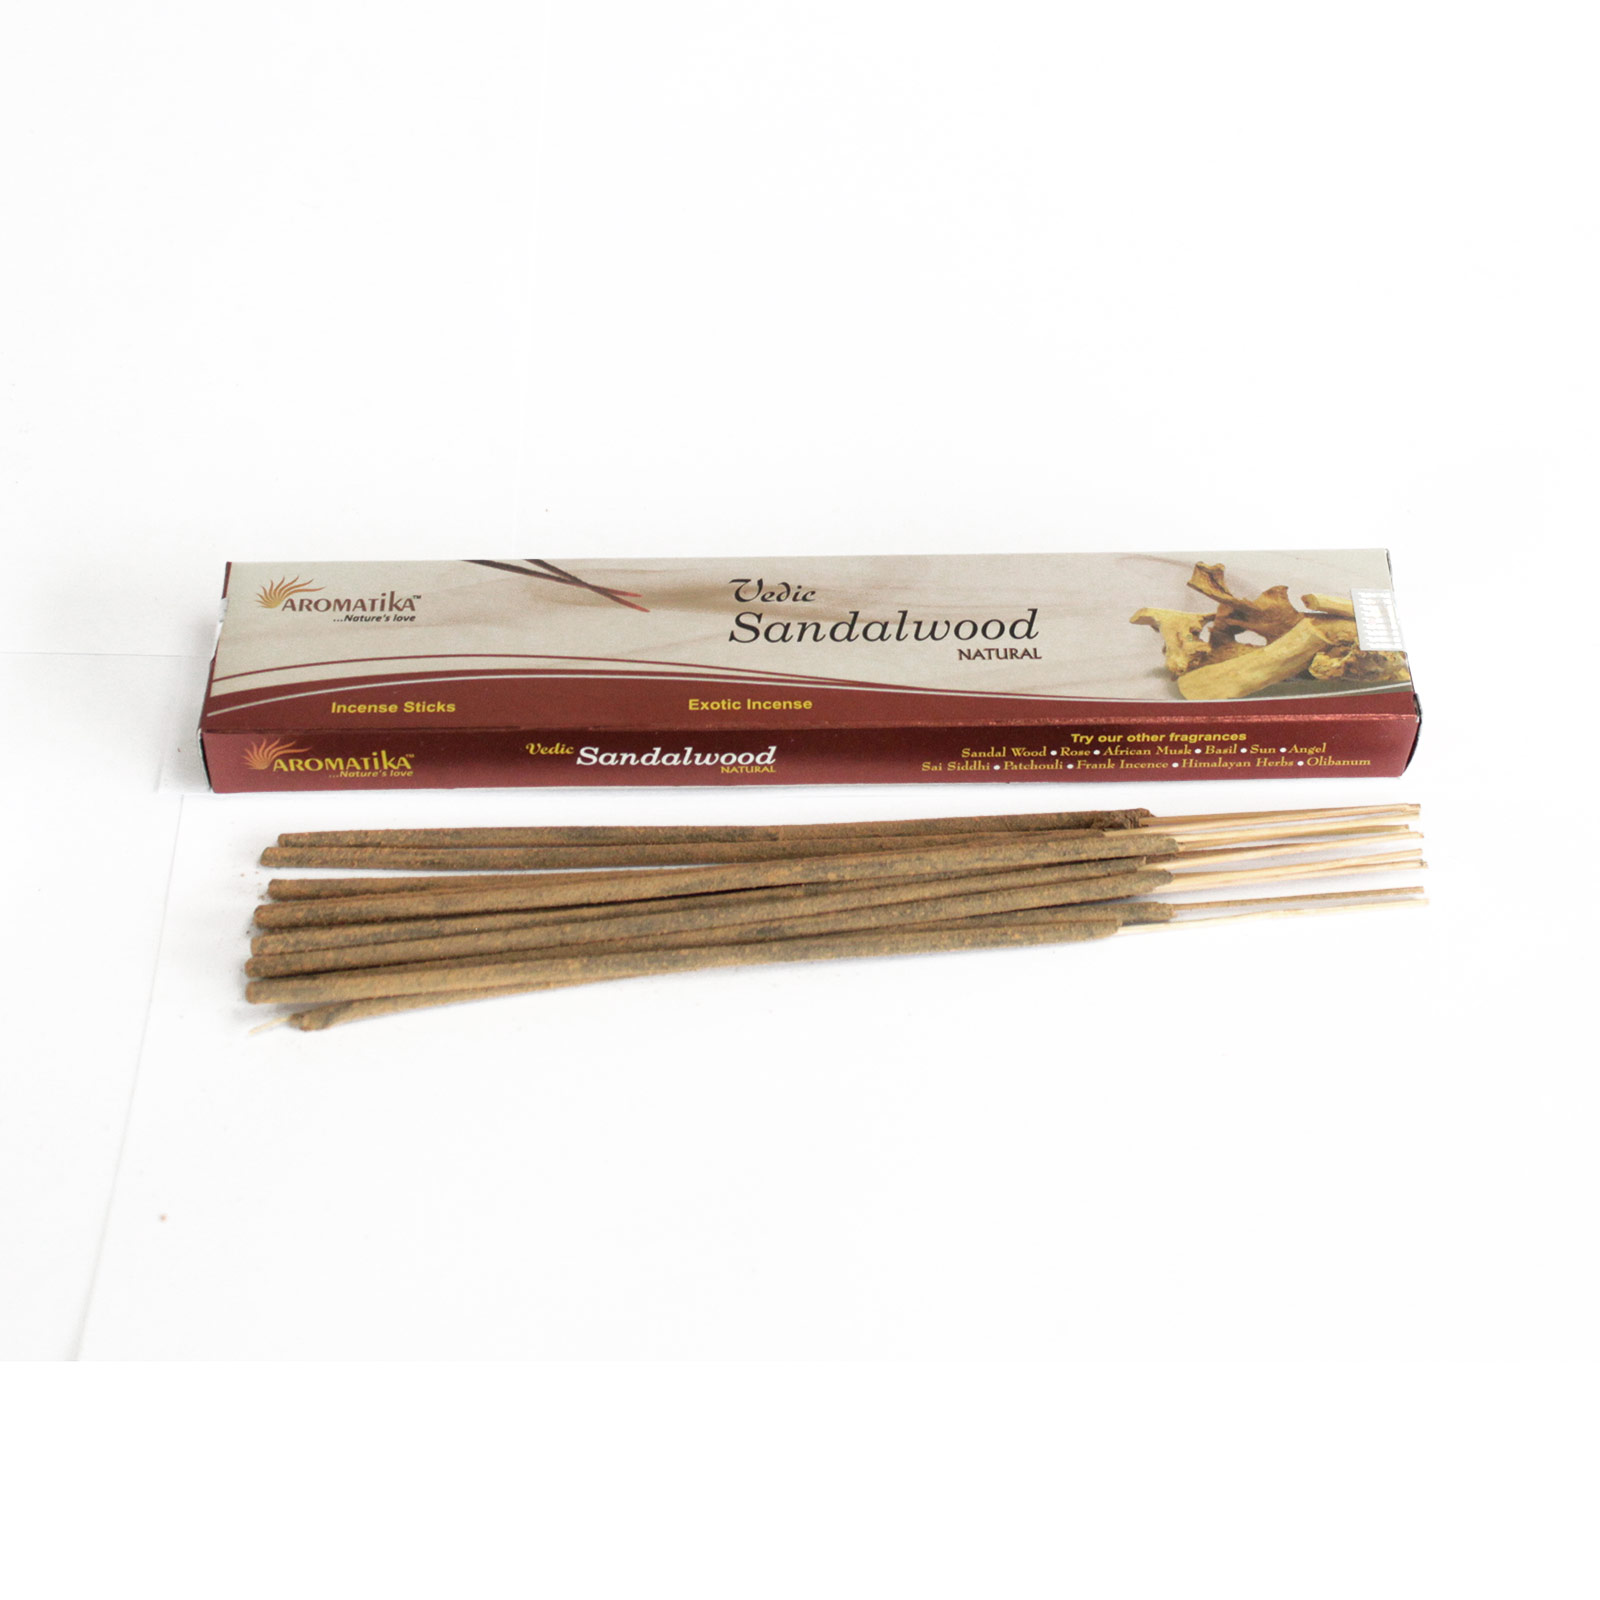 Vedic -Incense Sticks - Sandalwood